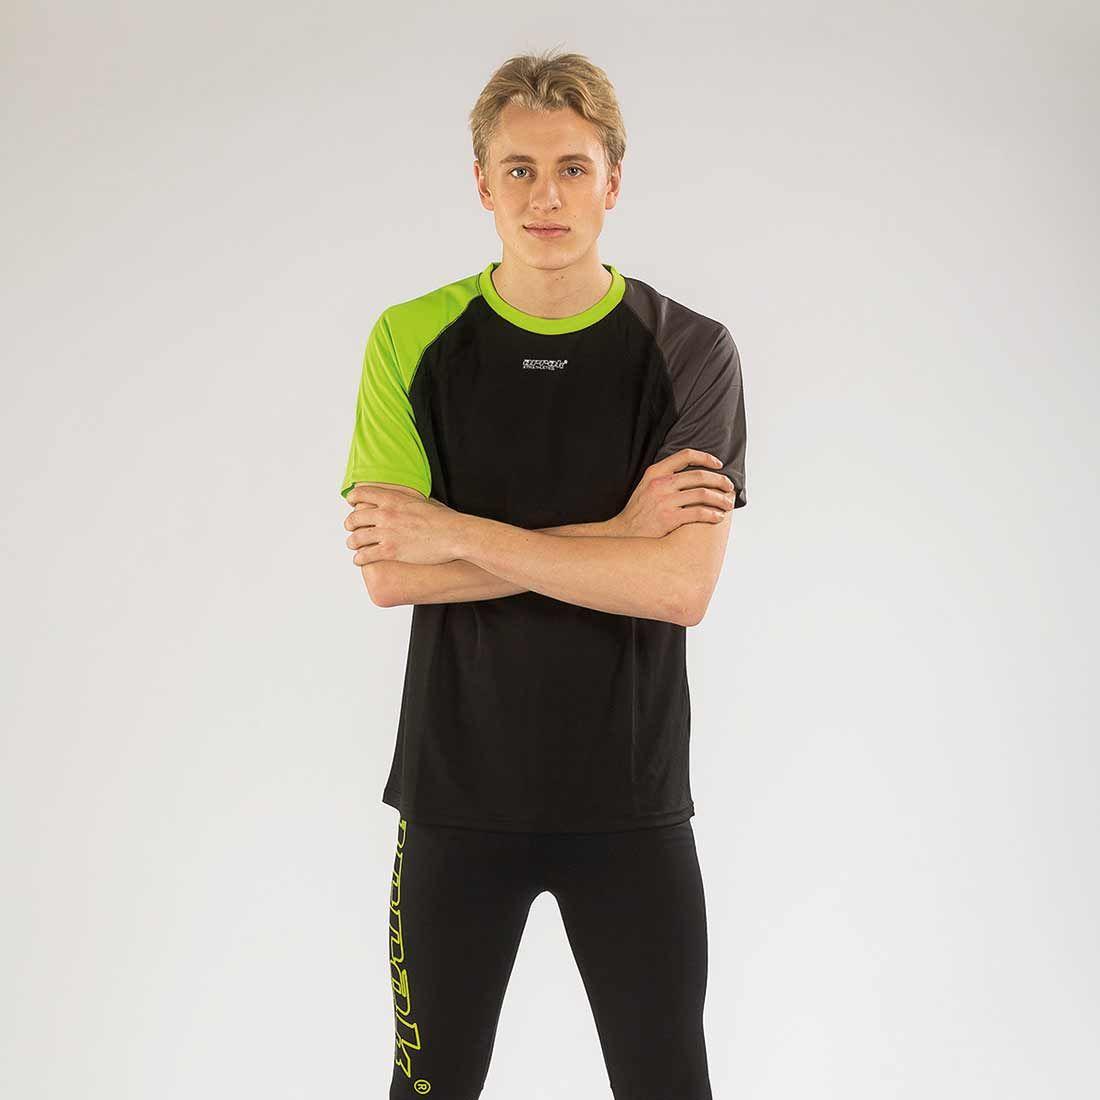 Arrak Function Tee Athletic Black/Green 3XL